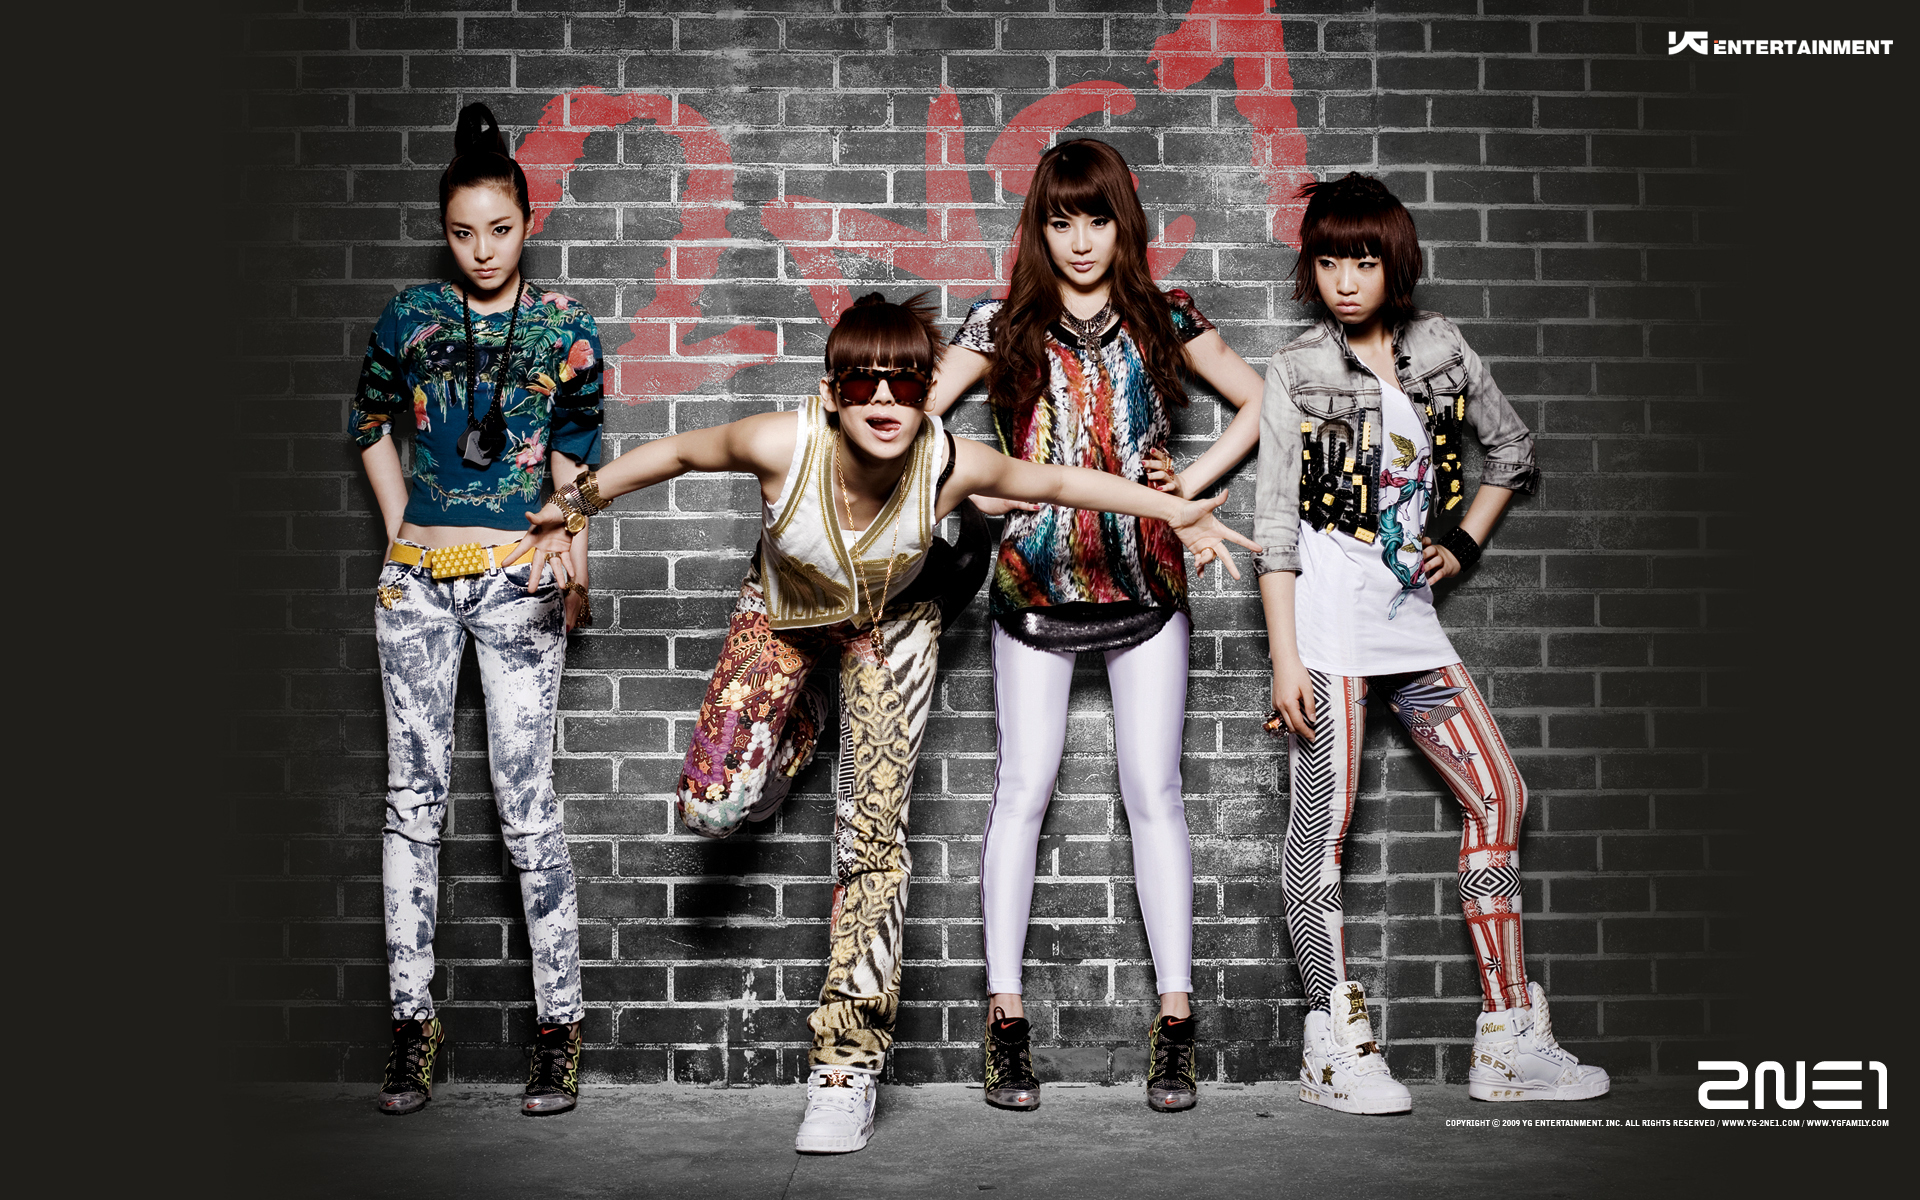 Las chicas de 2NE1 - 1920x1200